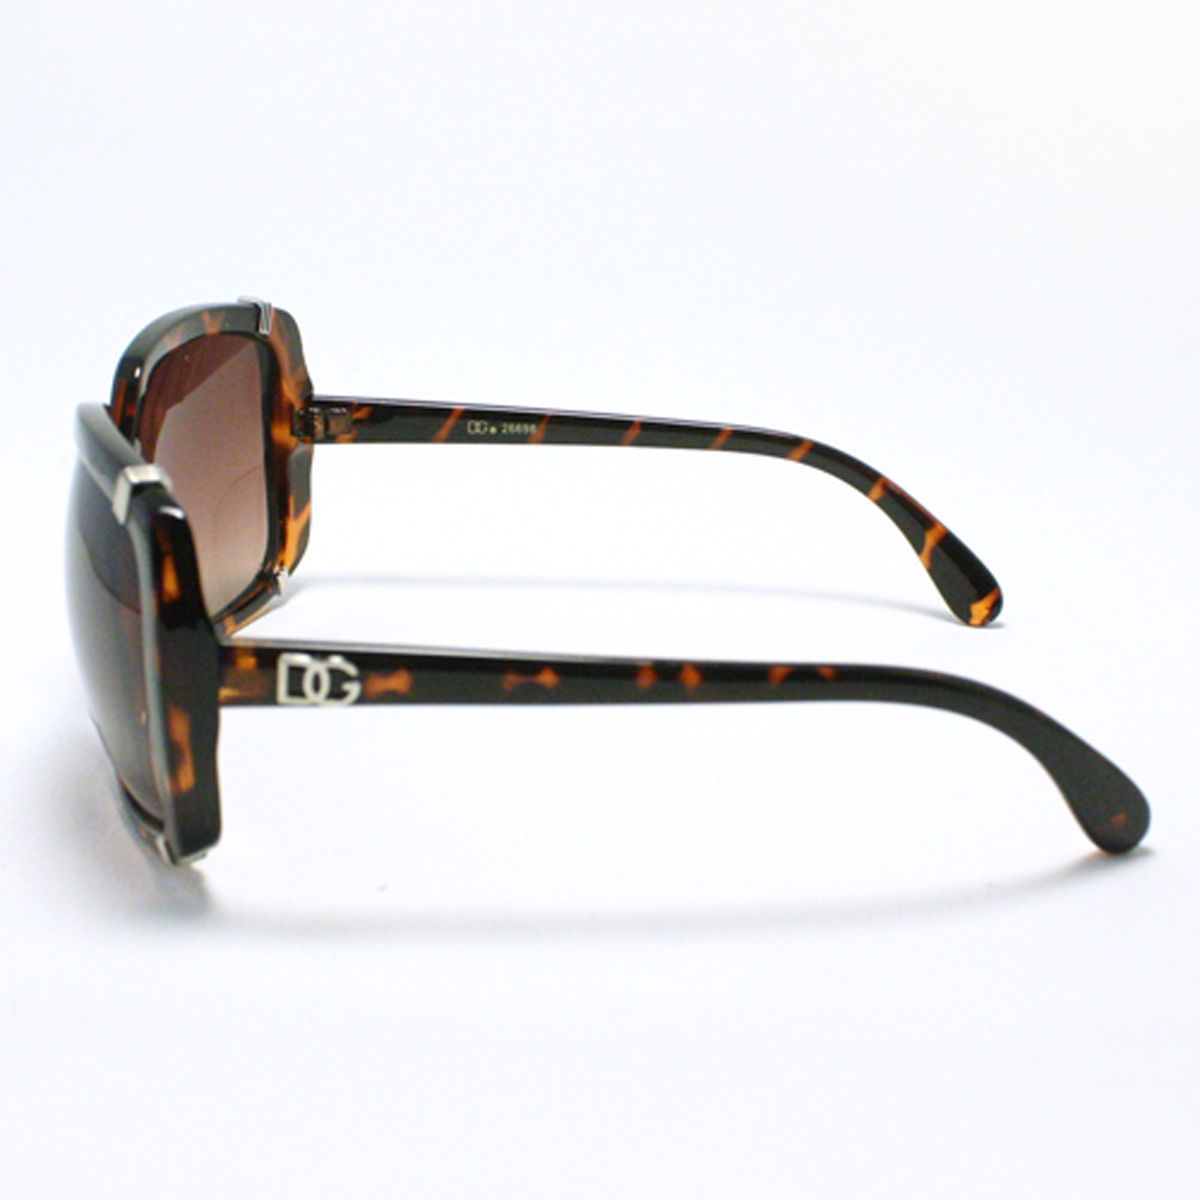 Womens Square Sunglasses Oversize Vintage Fashion Frame TORTOISE